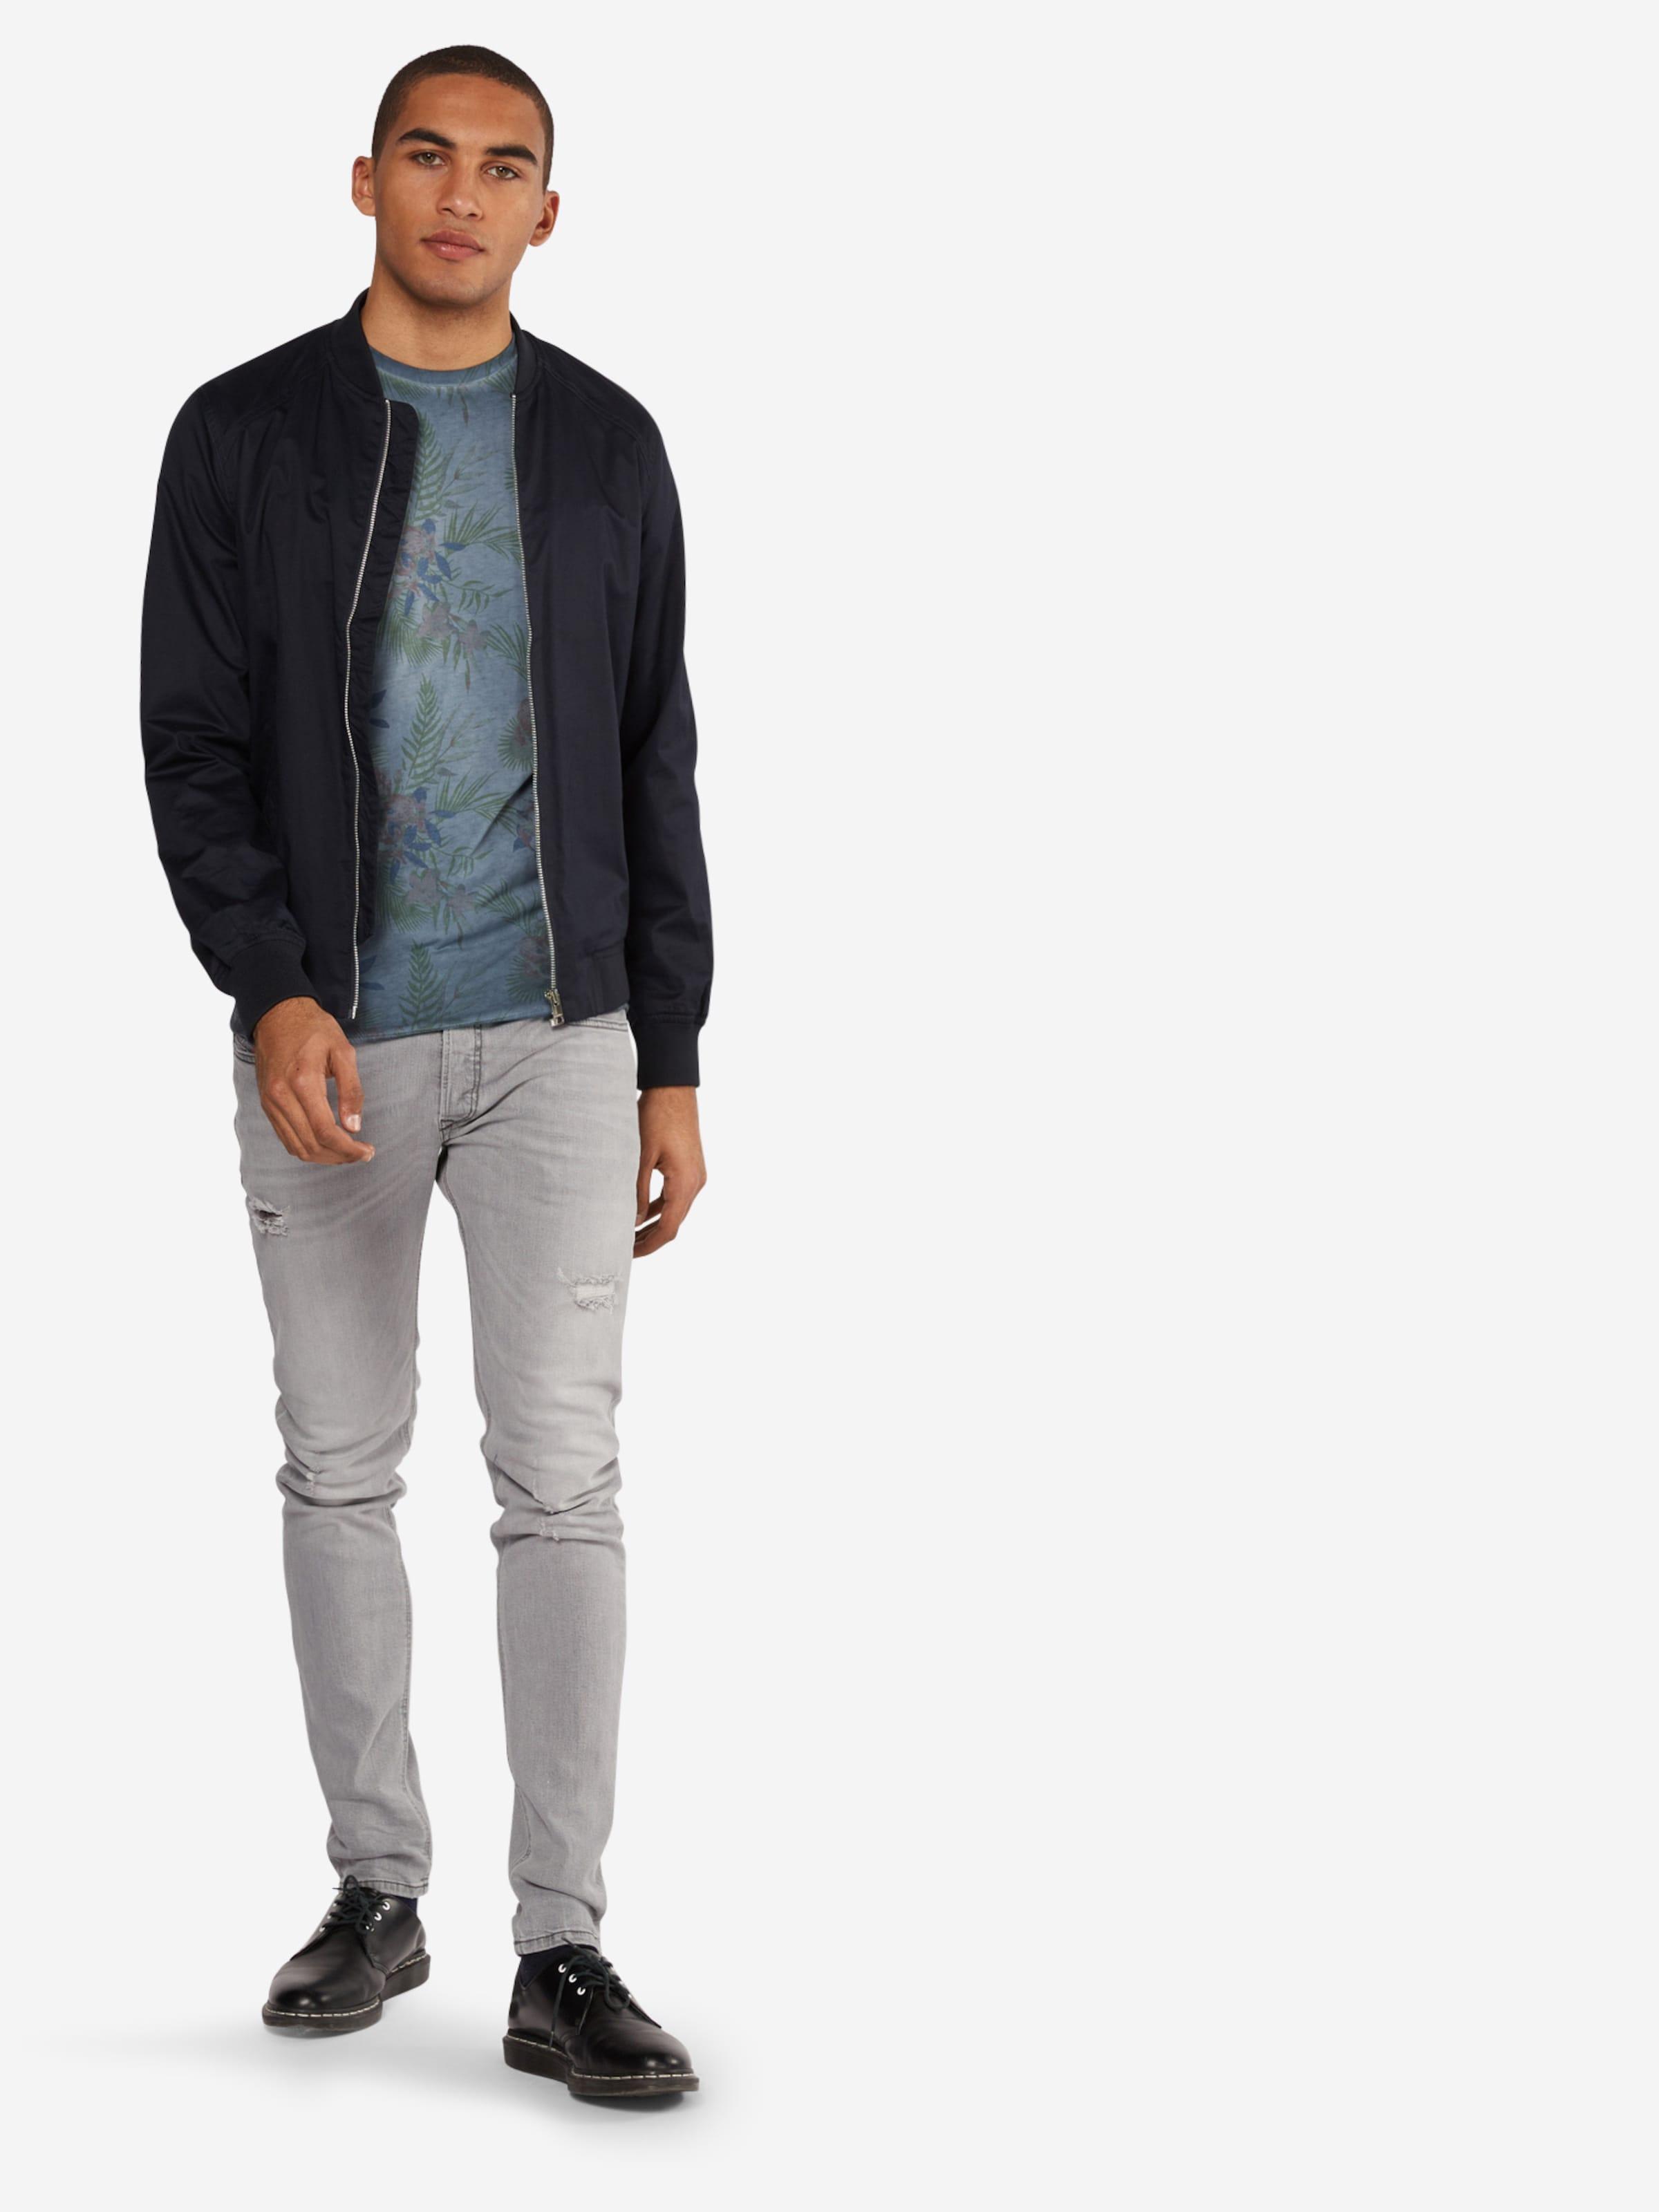 Pepe Jeans T-Shirt 'ADAN' Rabatt-Shop Für Beeile Dich kOXAqX